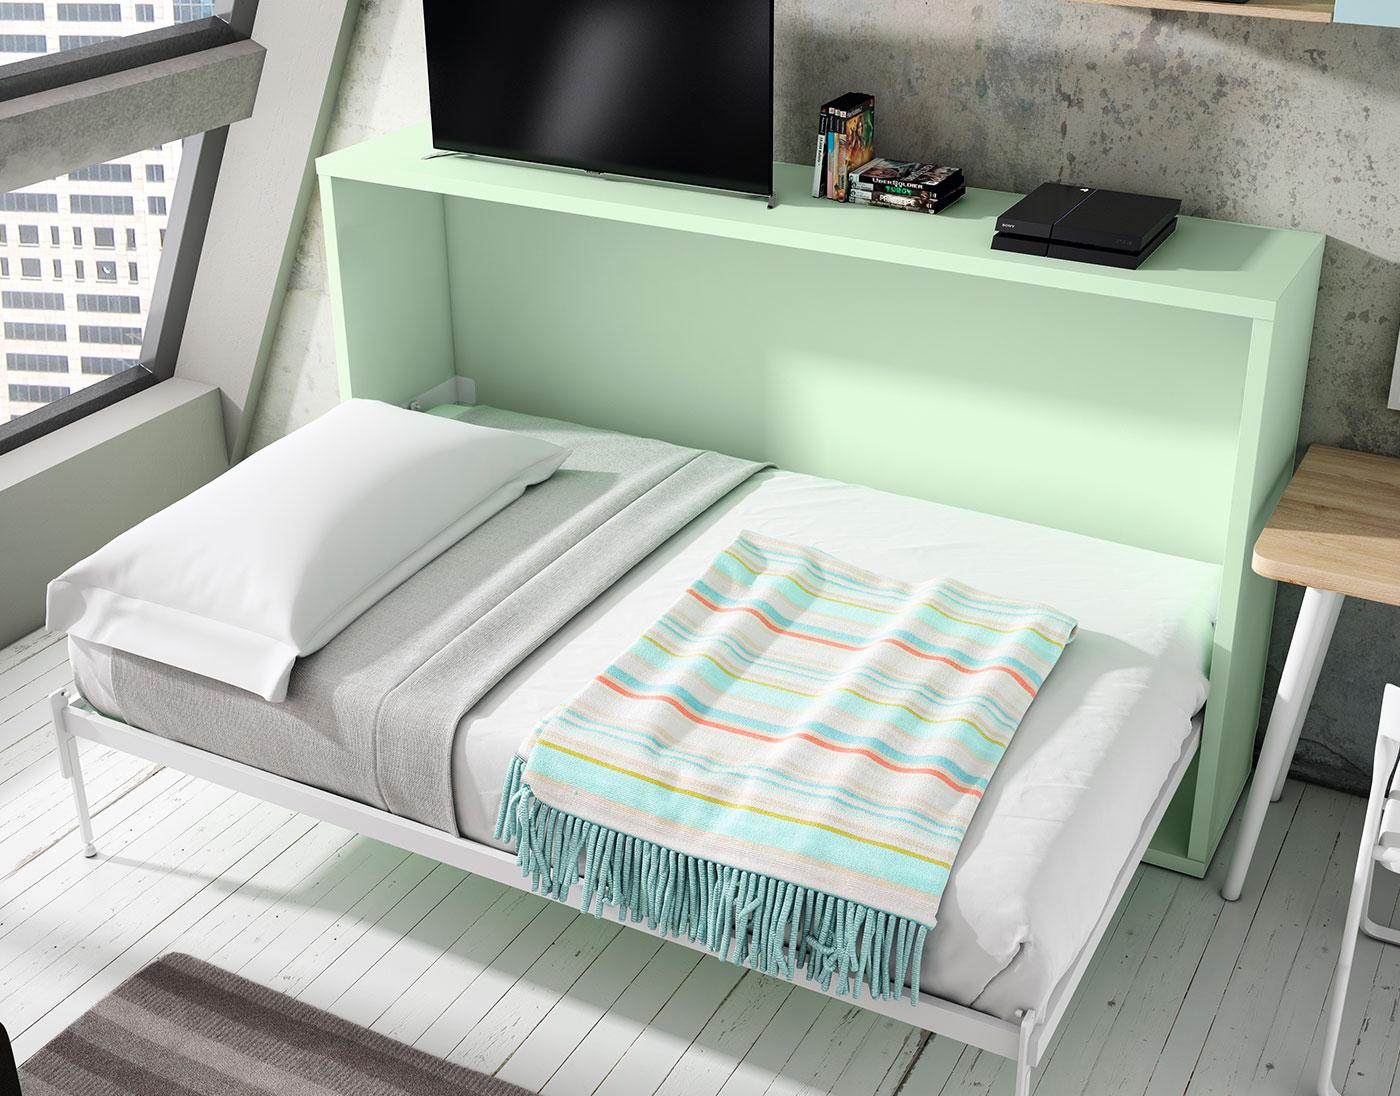 Wall beds ecuador camas ingeniosas para espacios reducidos - Cama para espacios reducidos ...